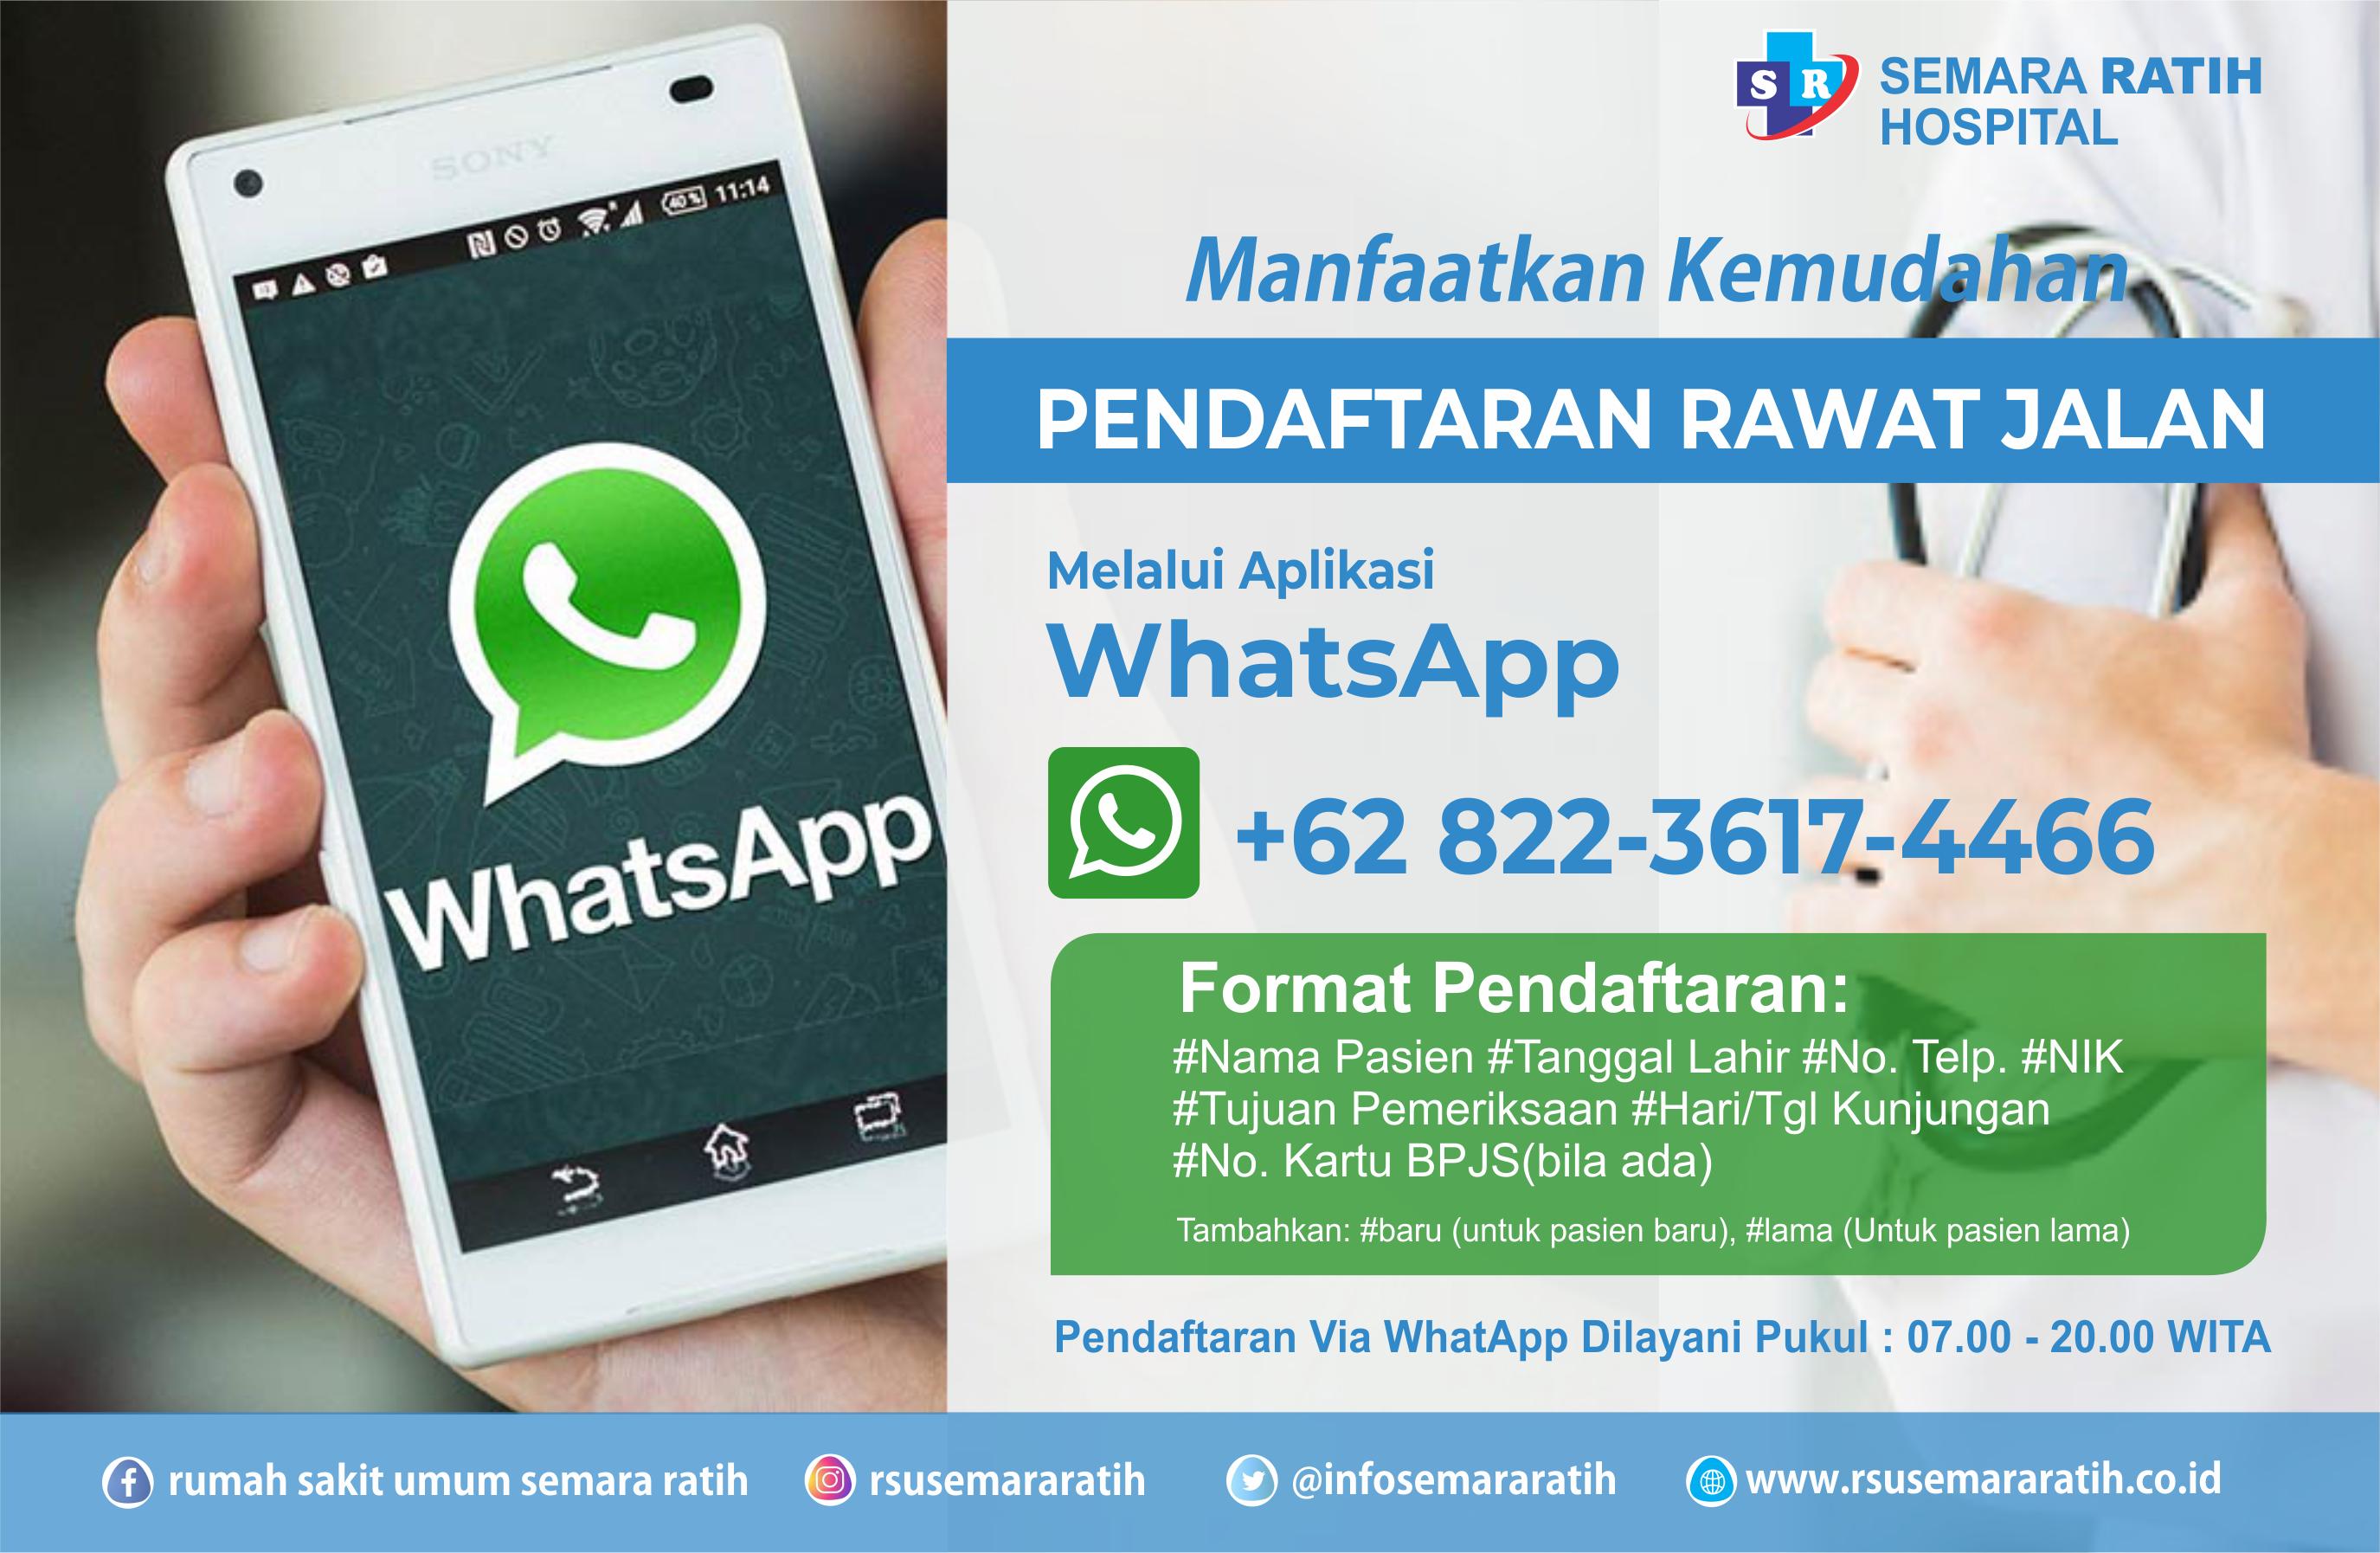 Pendaftaran Online Via WhatsApp